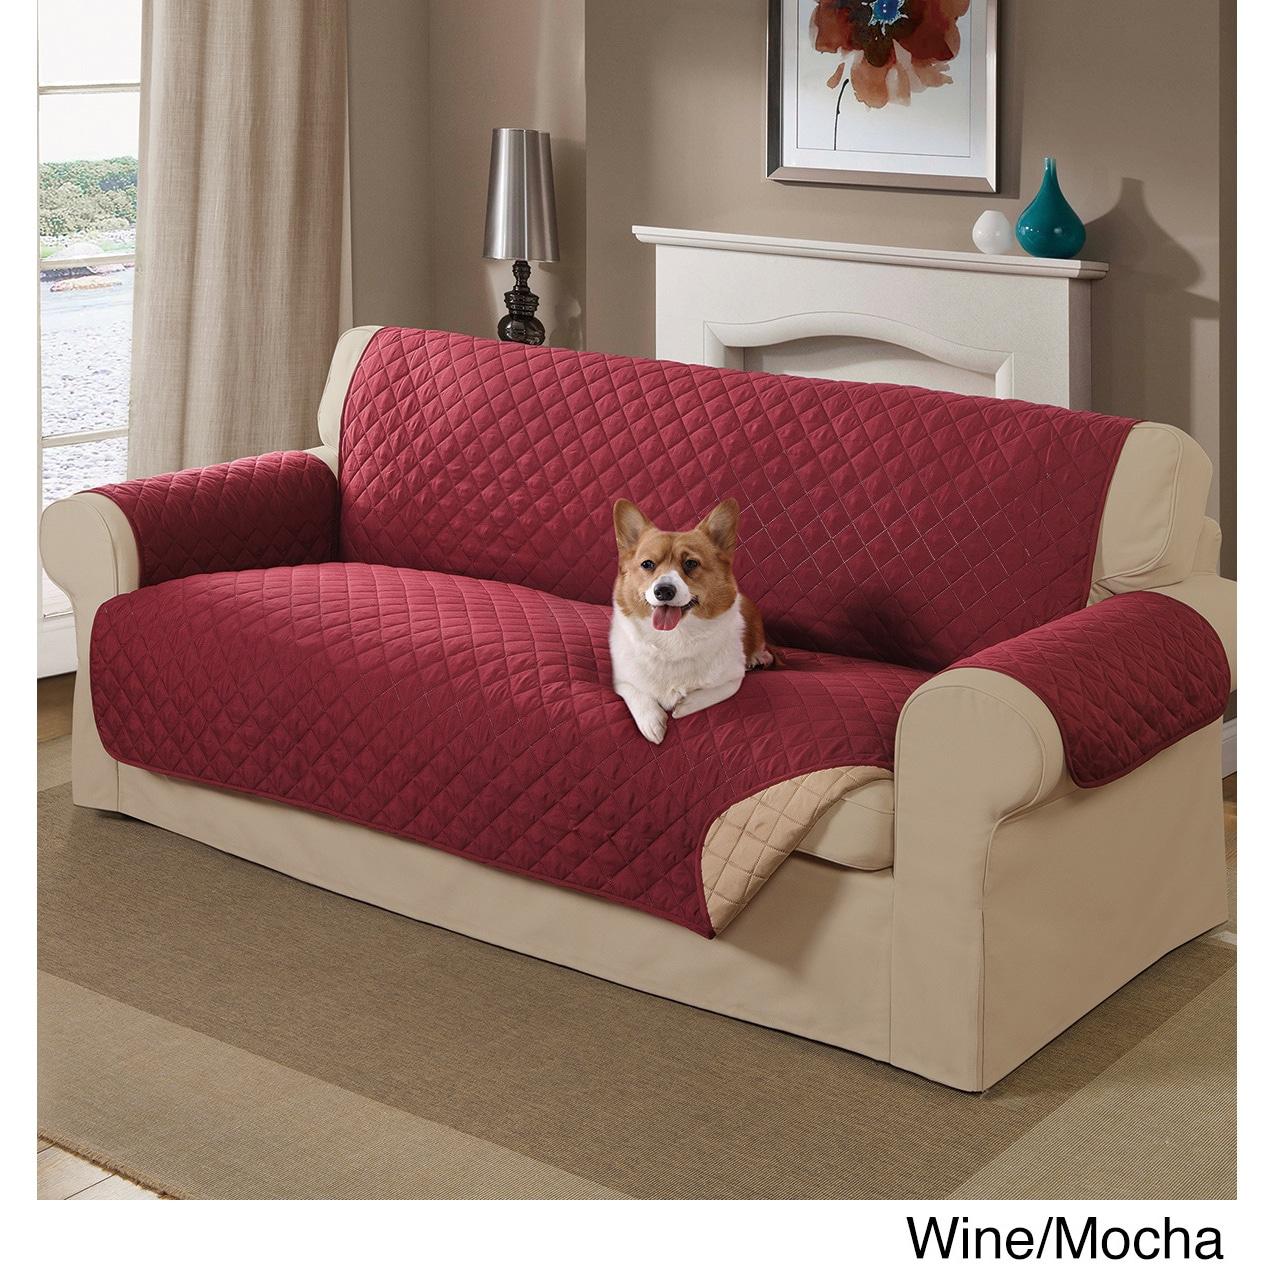 Home Decor Reversible Pet Sofa Cover (Wine/Mocha), Red (A...